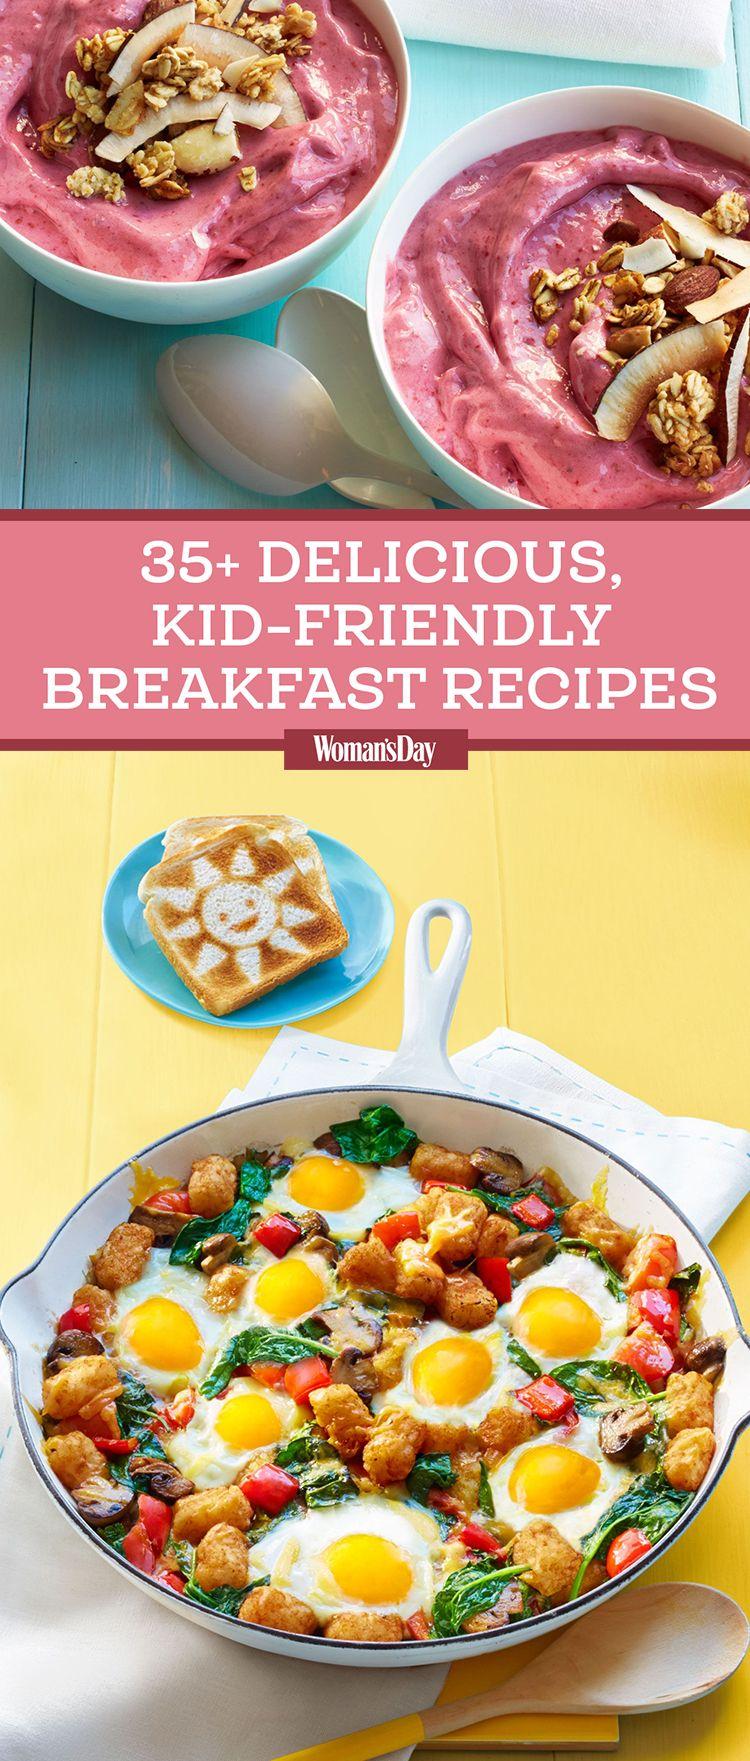 Easy Kid Friendly Breakfast Recipes To Start The Morning Off Right Kid Friendly Recipes Breakfast Kid Friendly Breakfasts Breakfast For Kids